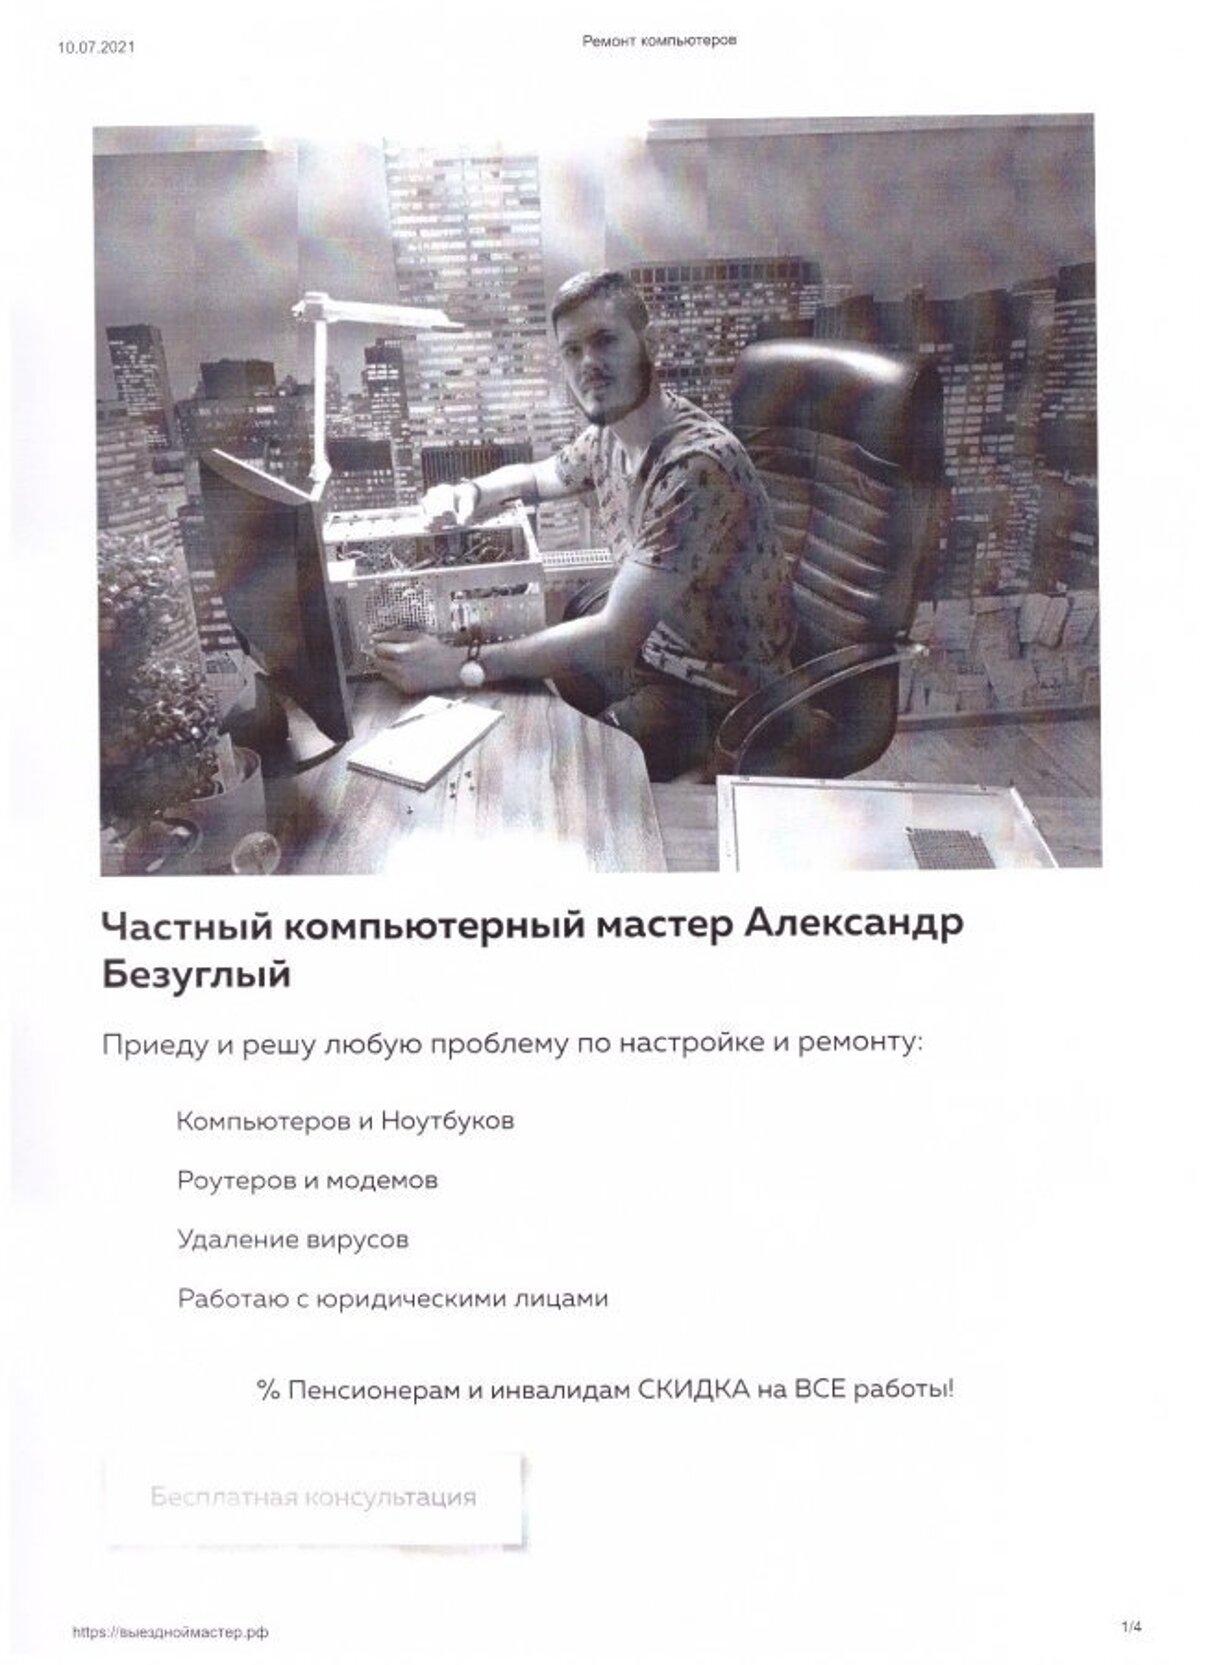 Жалоба-отзыв: Безуглов Александр (фото) - Фото